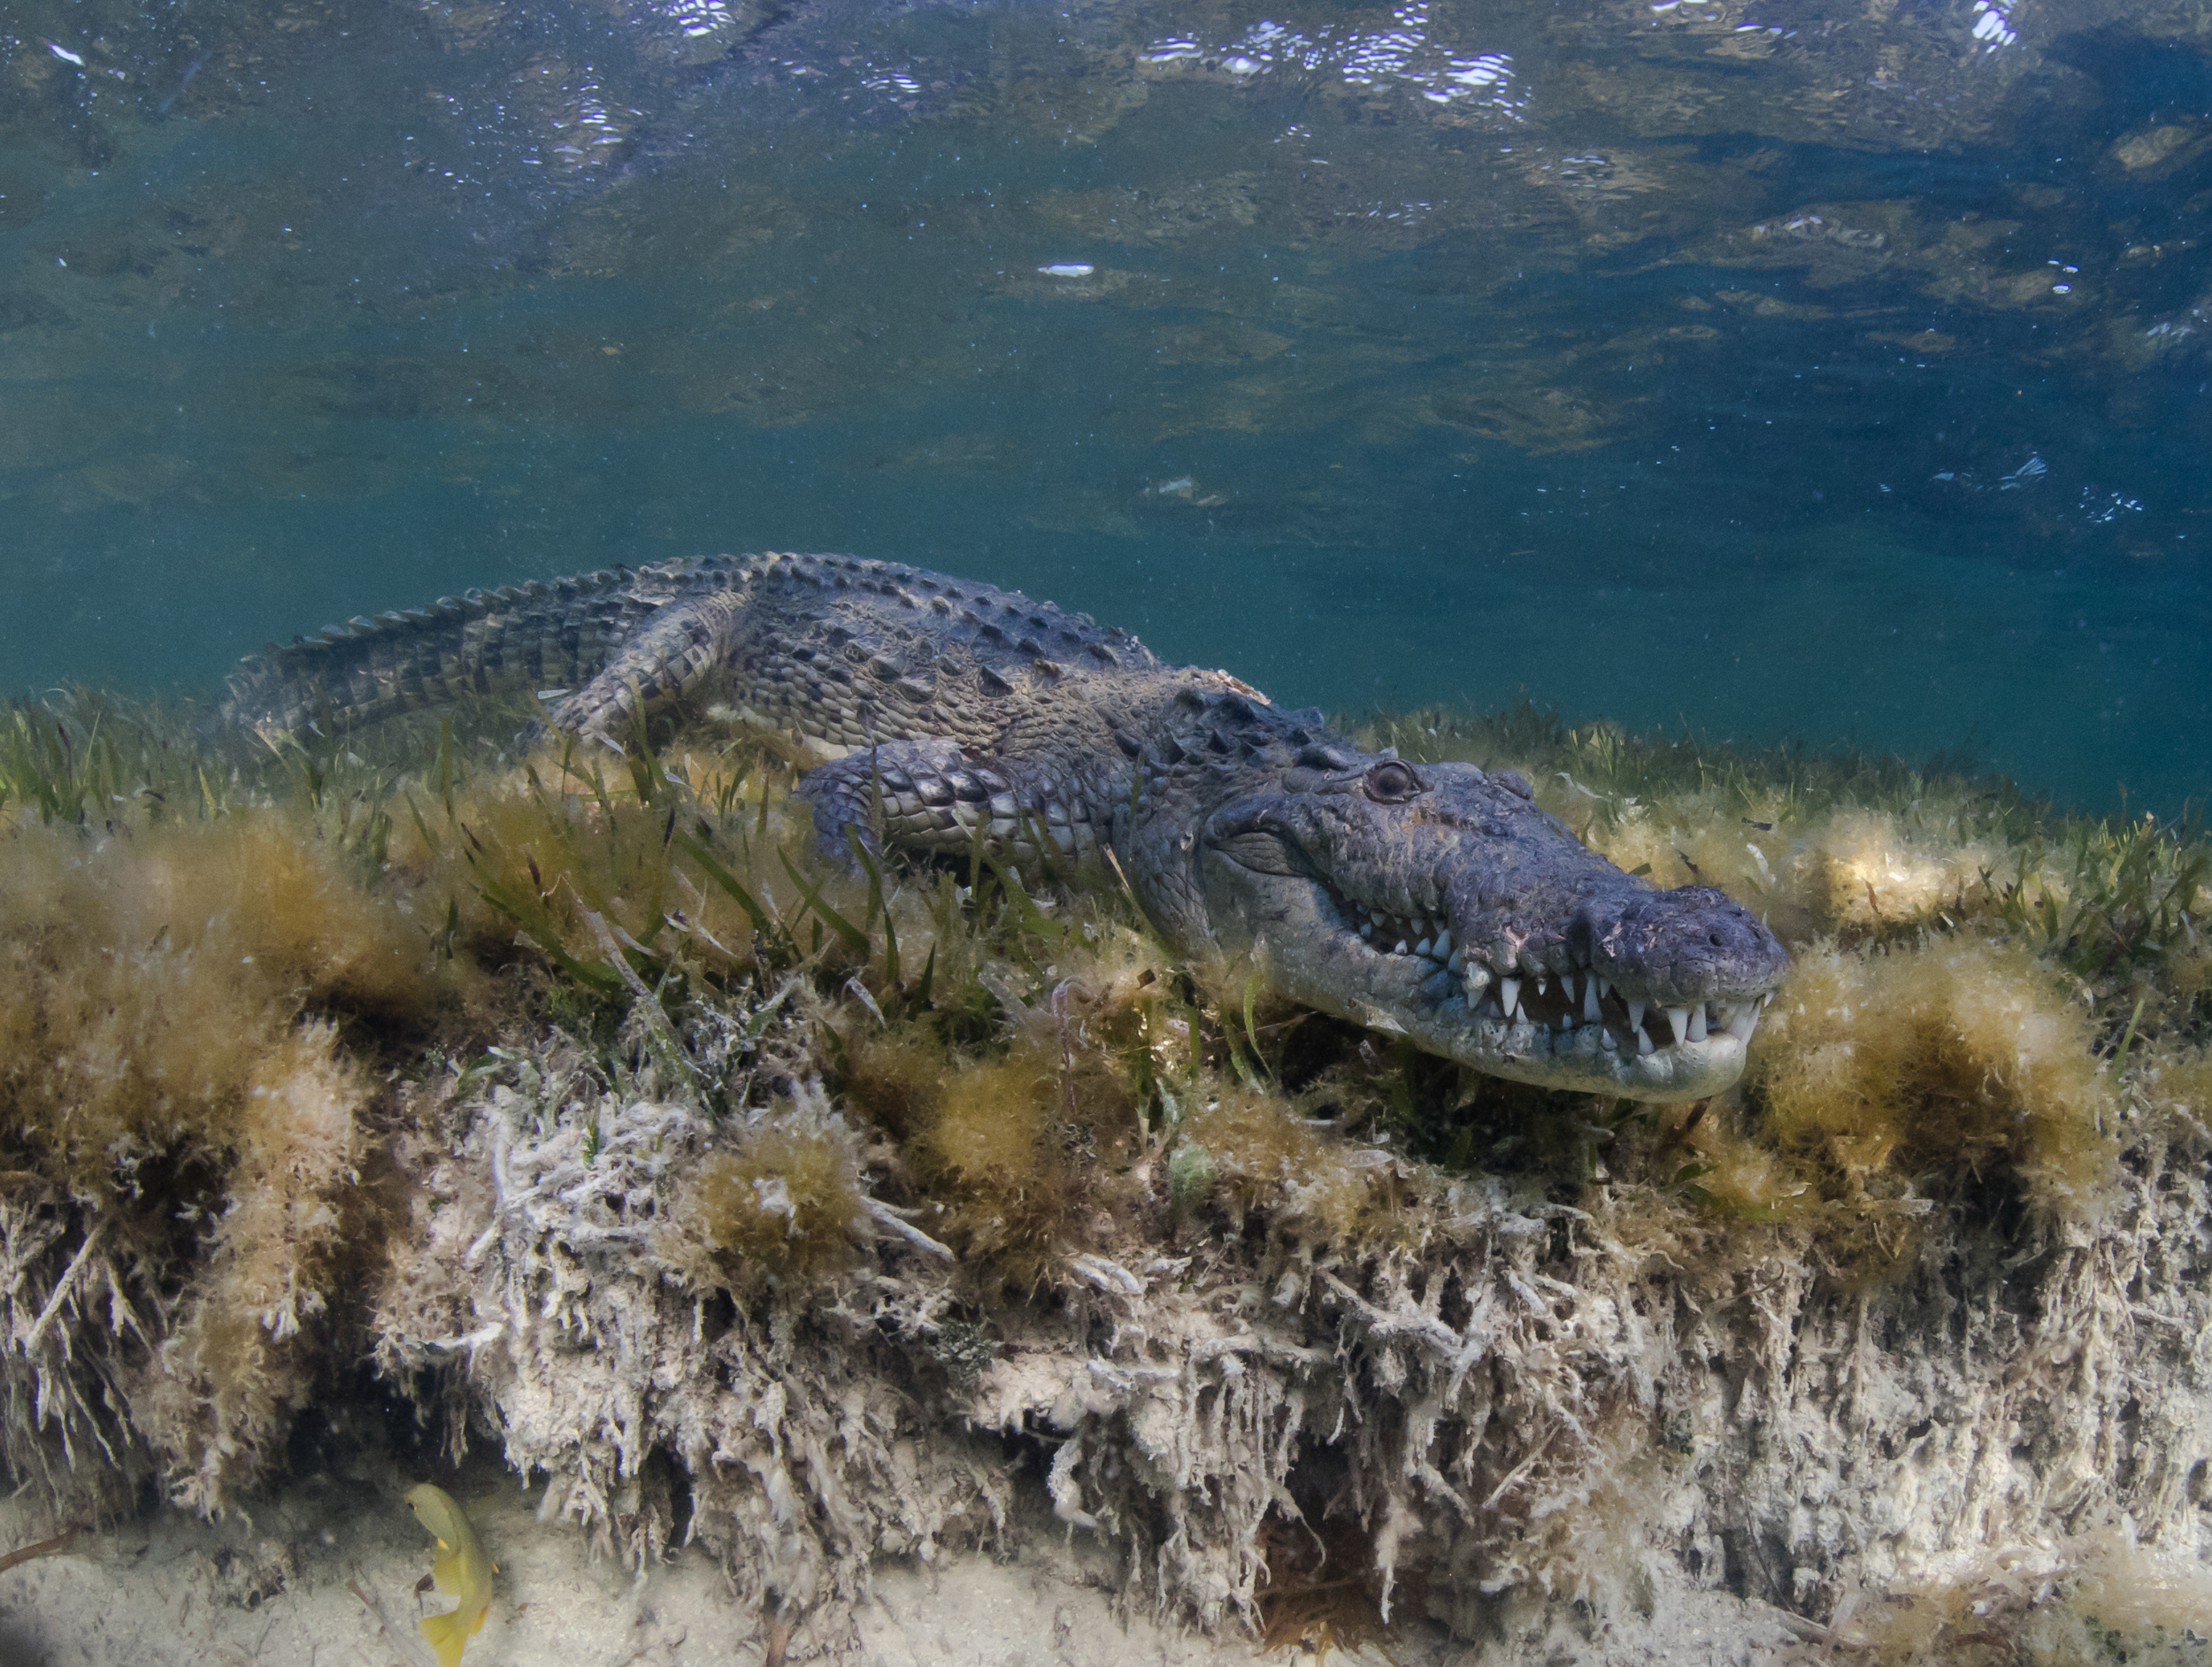 crocodile in CHINCHORRO BANKS, MEXICO credit: phillip hamilton / coral reef image bank